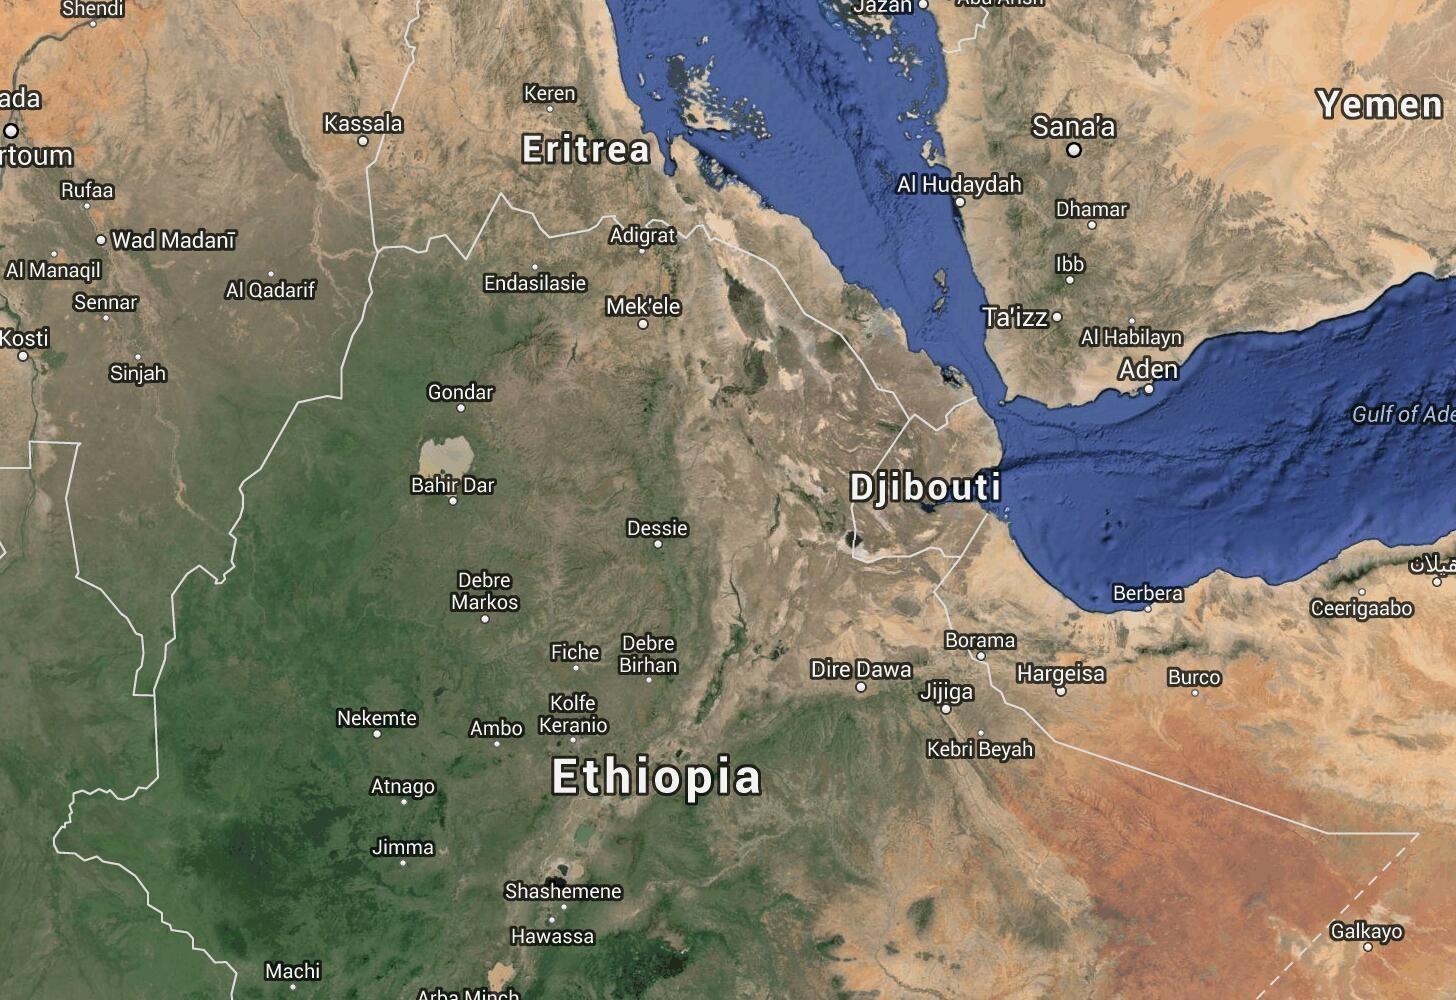 Ethiopia Map: Addis Ababa — Tigray | Ethiopia Google ... on